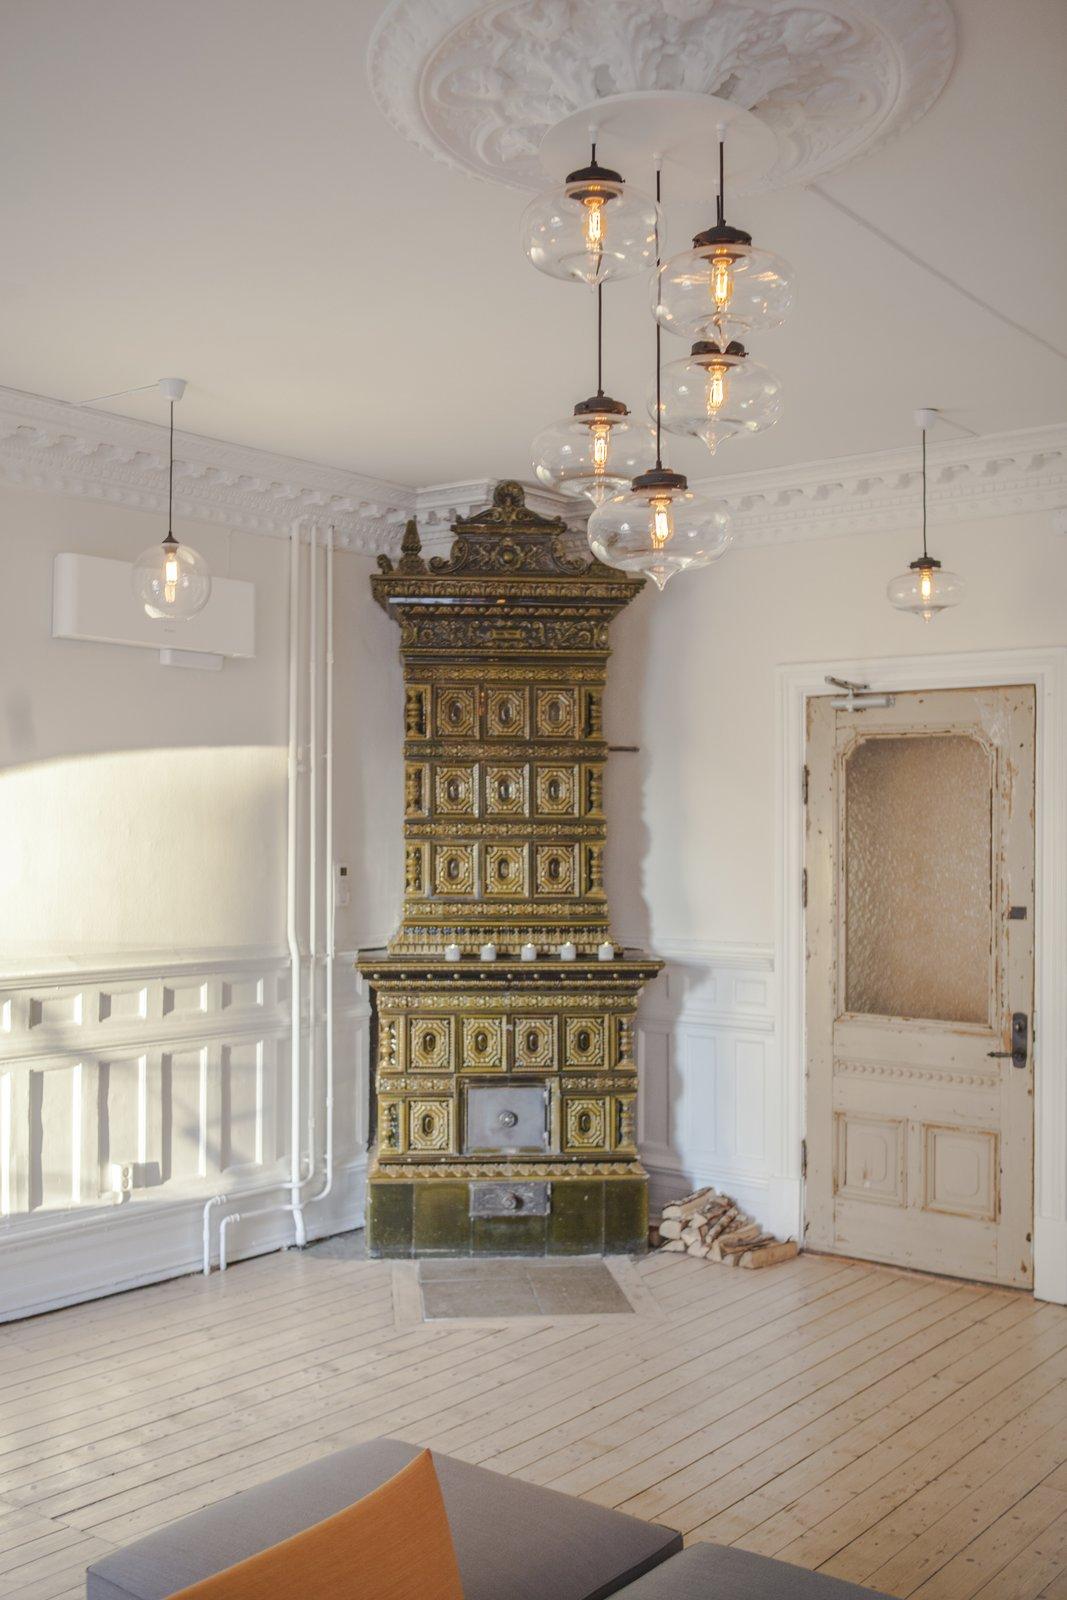 Photo 3 of 5 in Stunning Office Pendant Lighting Display Brightens Swedish Brand's Workspace